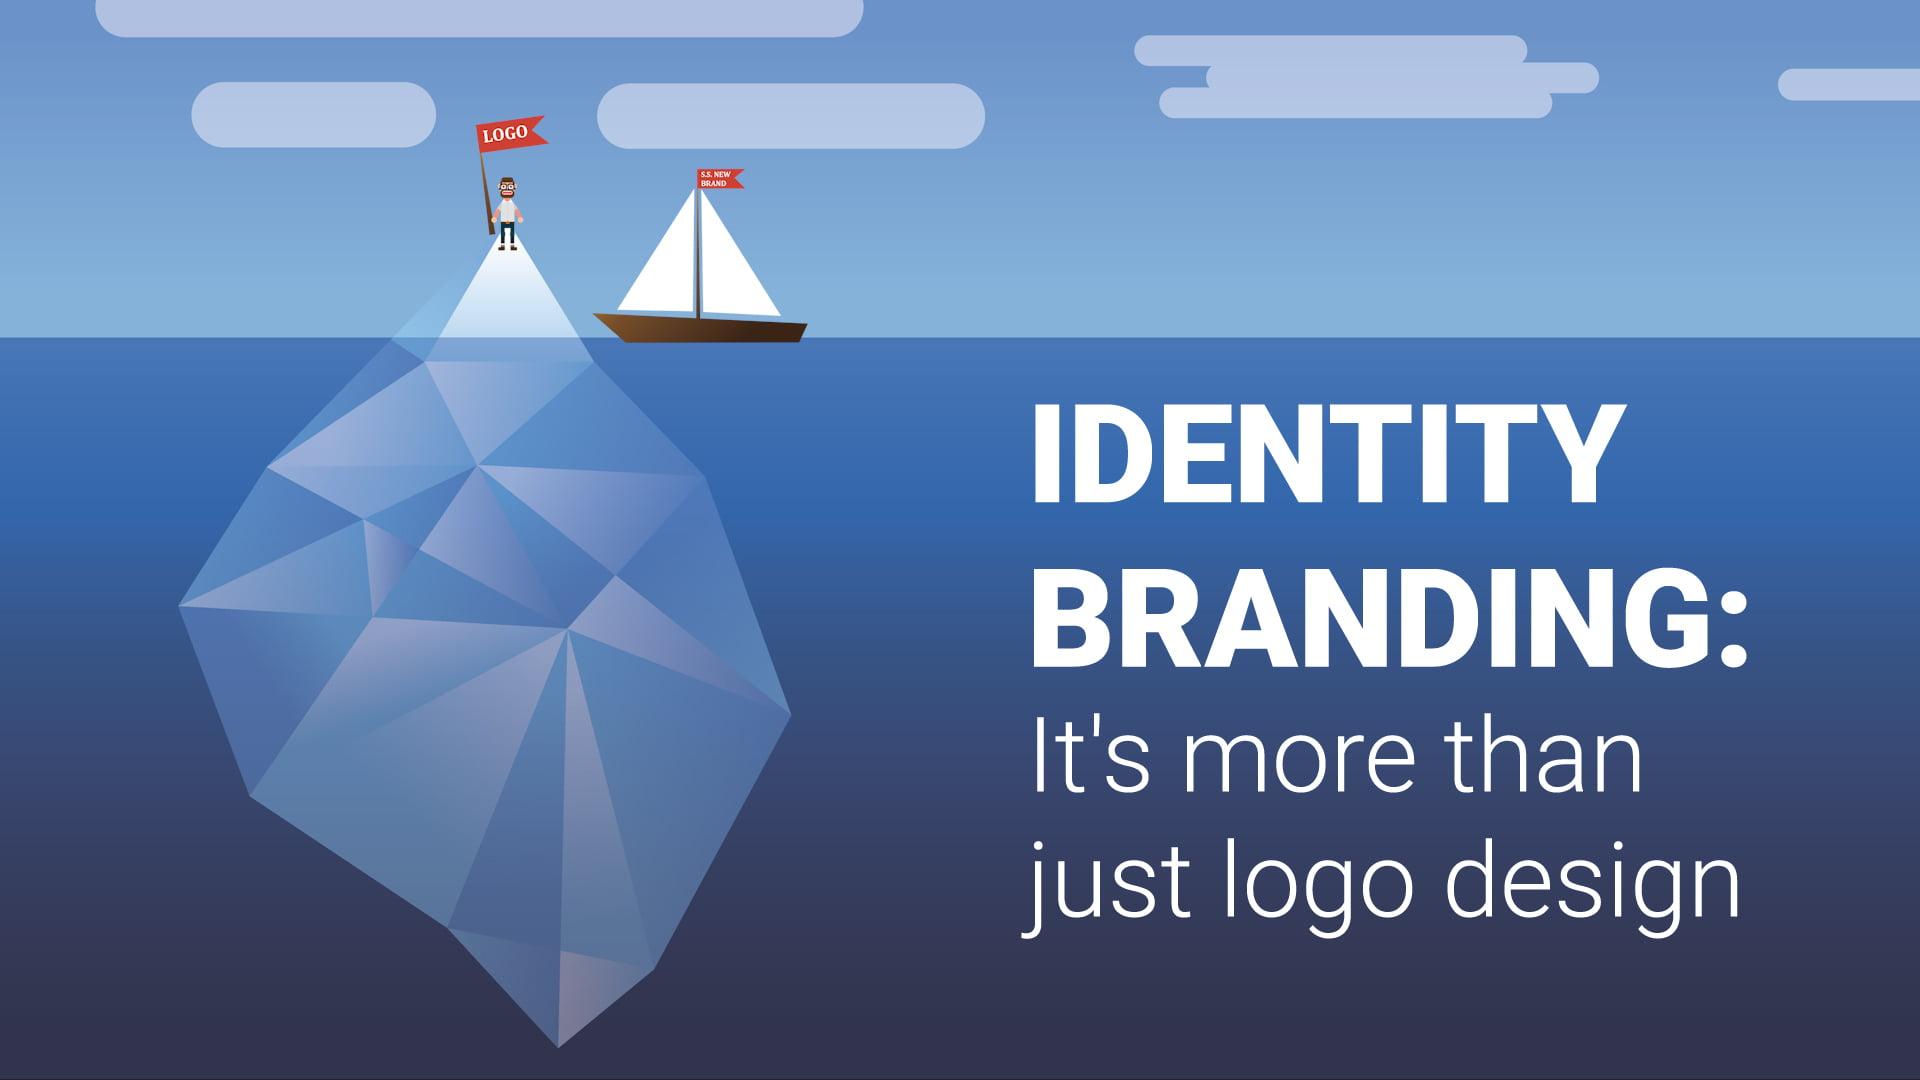 Identity Branding: It's more than just logo design